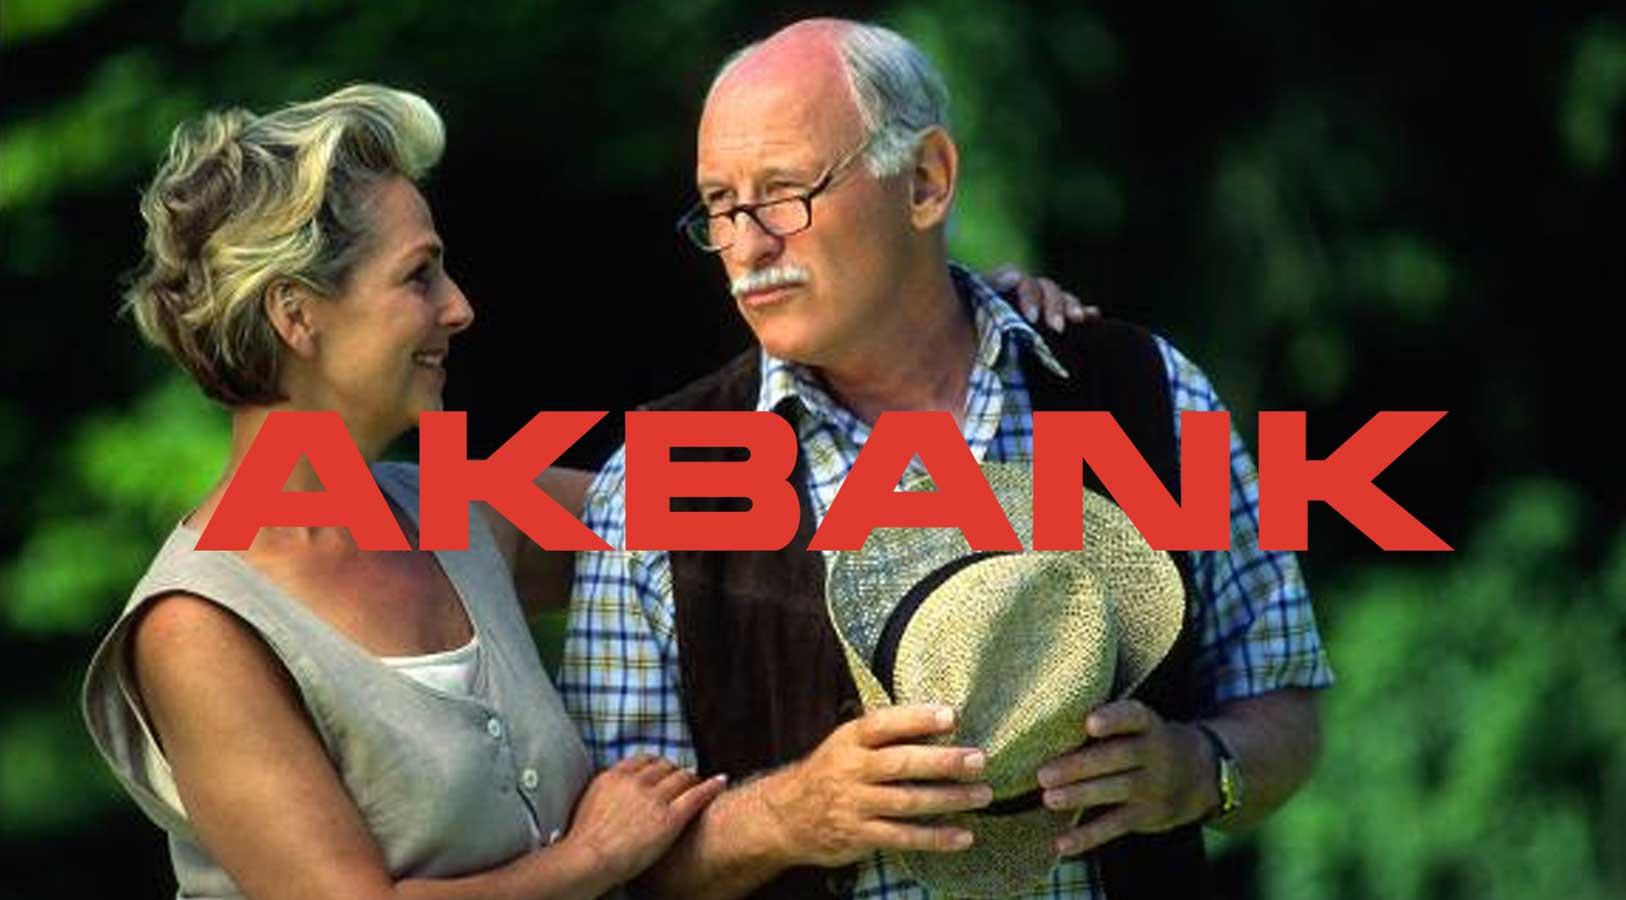 Akbank Emekli Promosyonu